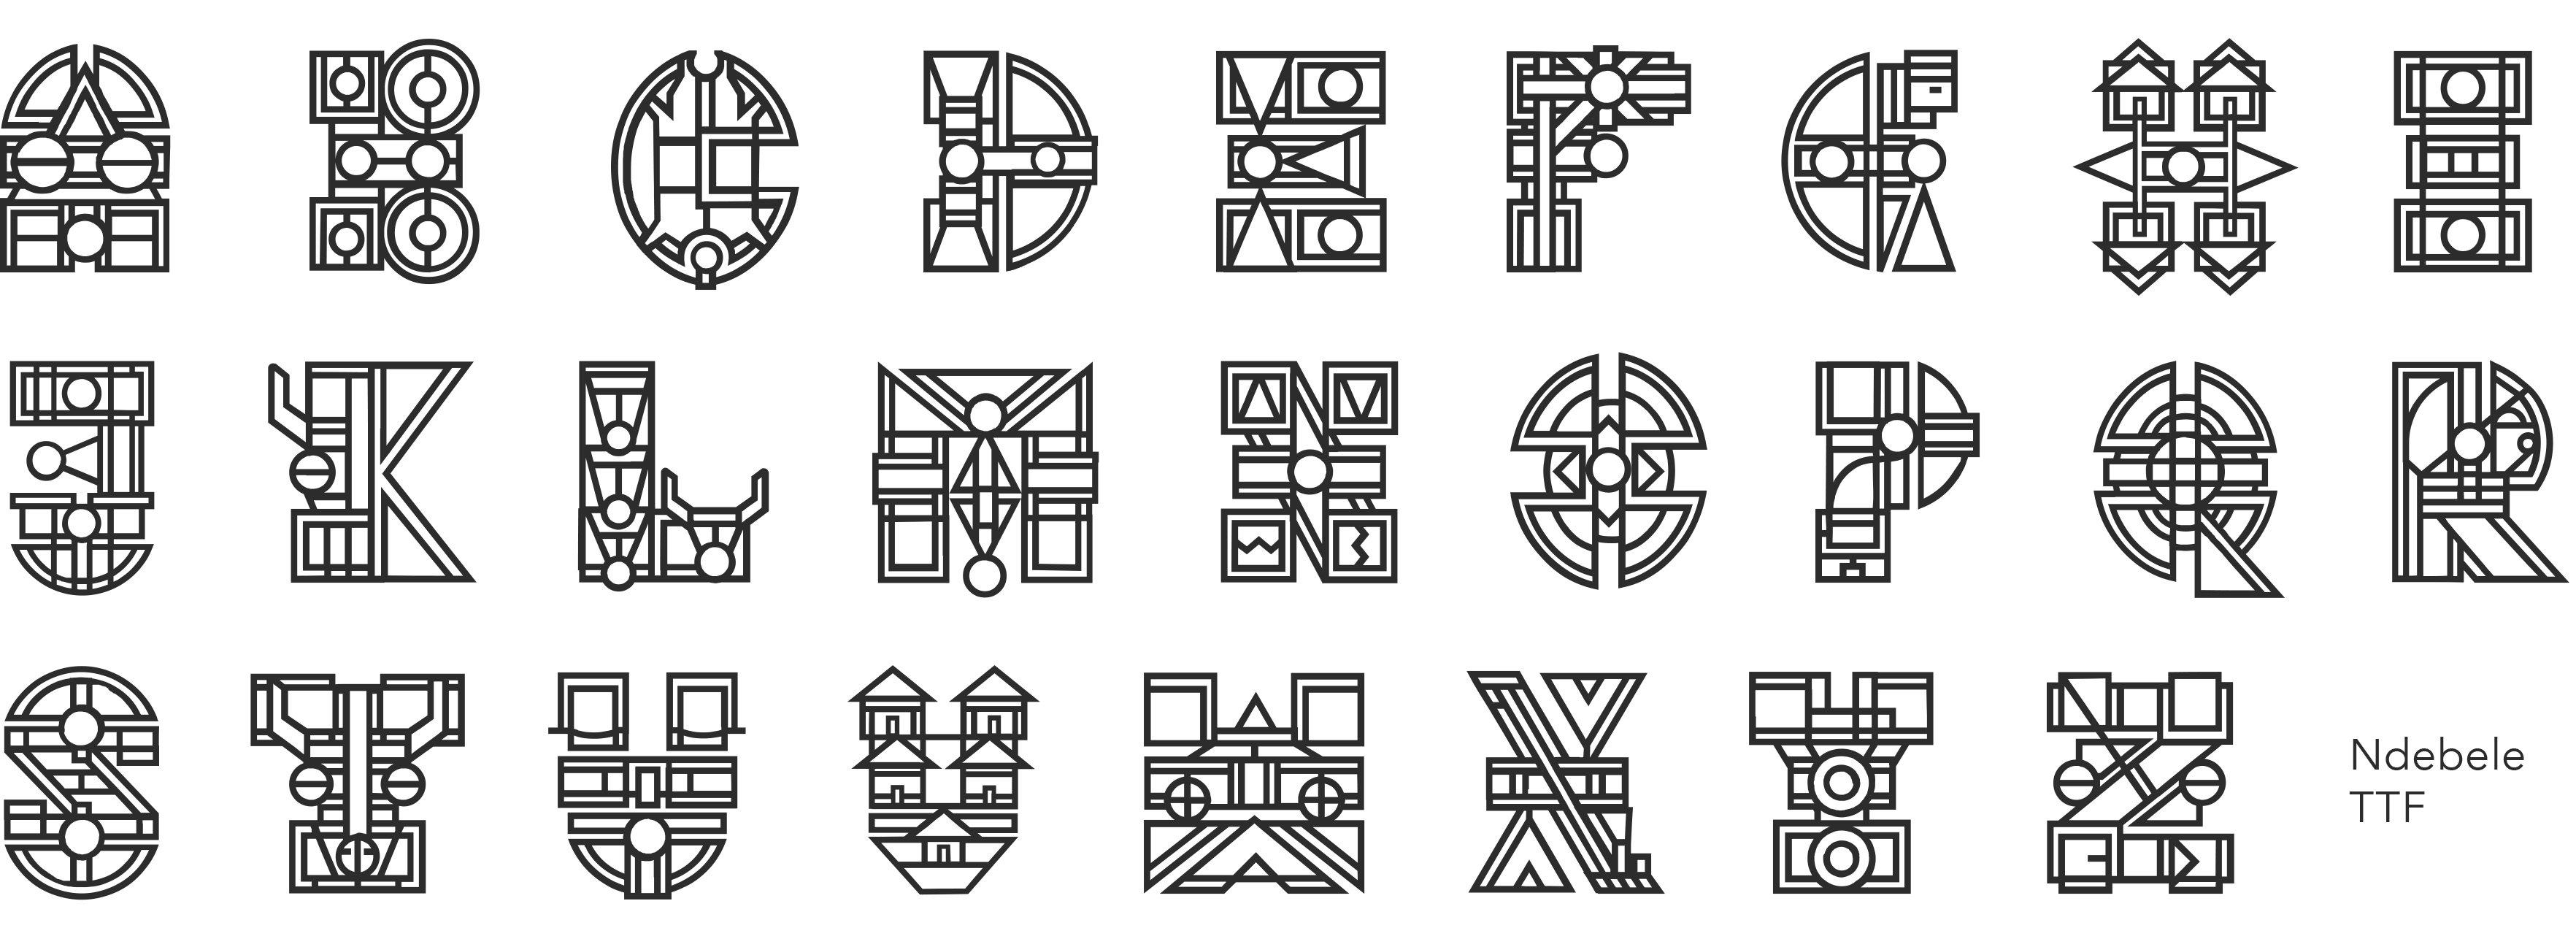 Paint Drip Melt Fonts - best menu template design